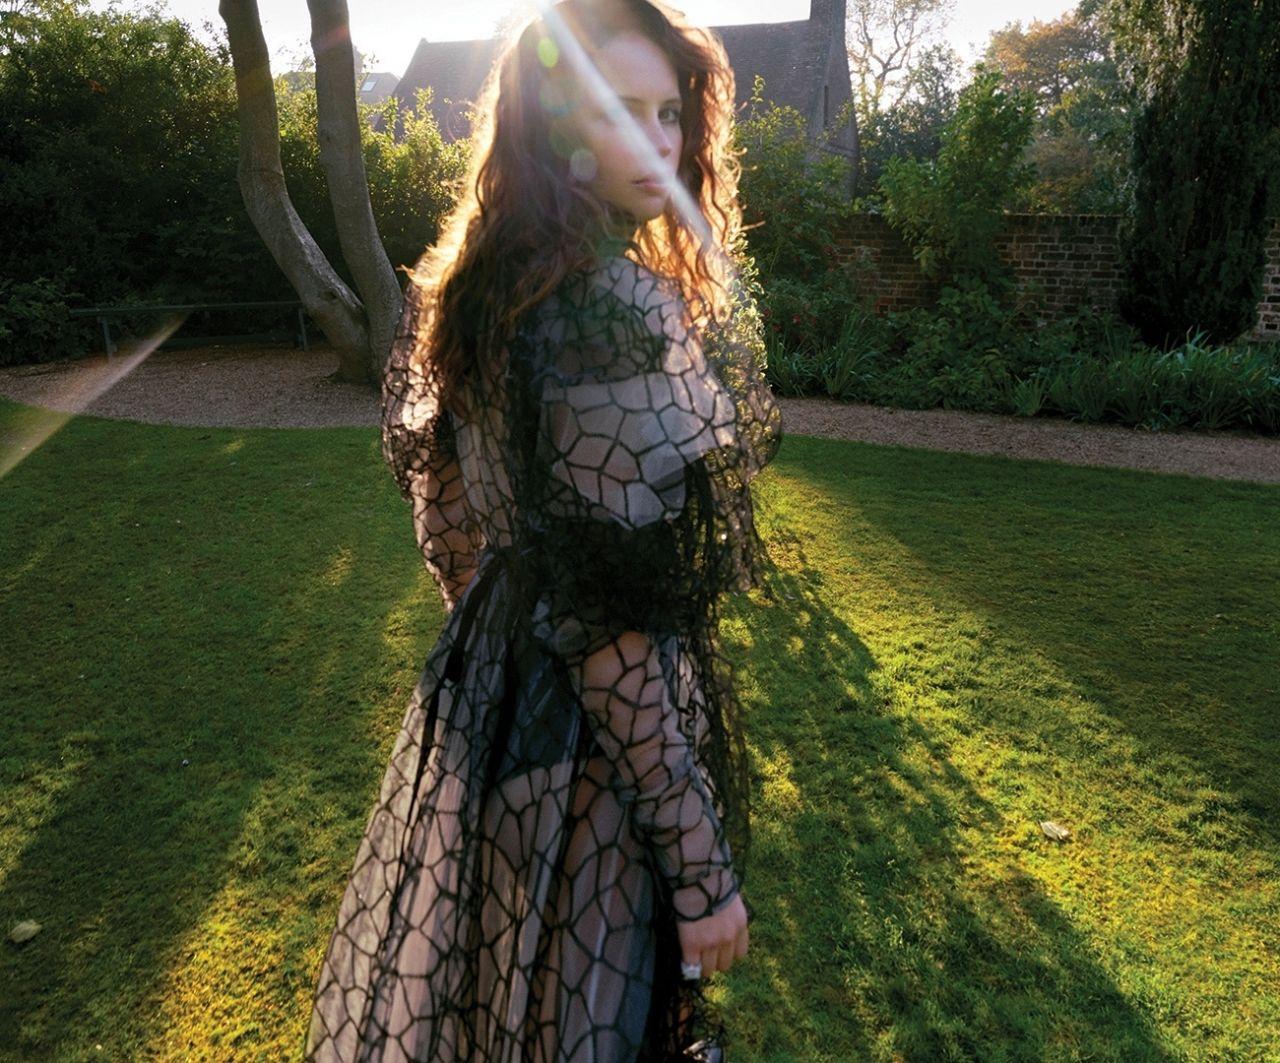 https://celebmafia.com/wp-content/uploads/2018/12/felicity-jones-dujour-magazine-november-2018-photos-2.jpg